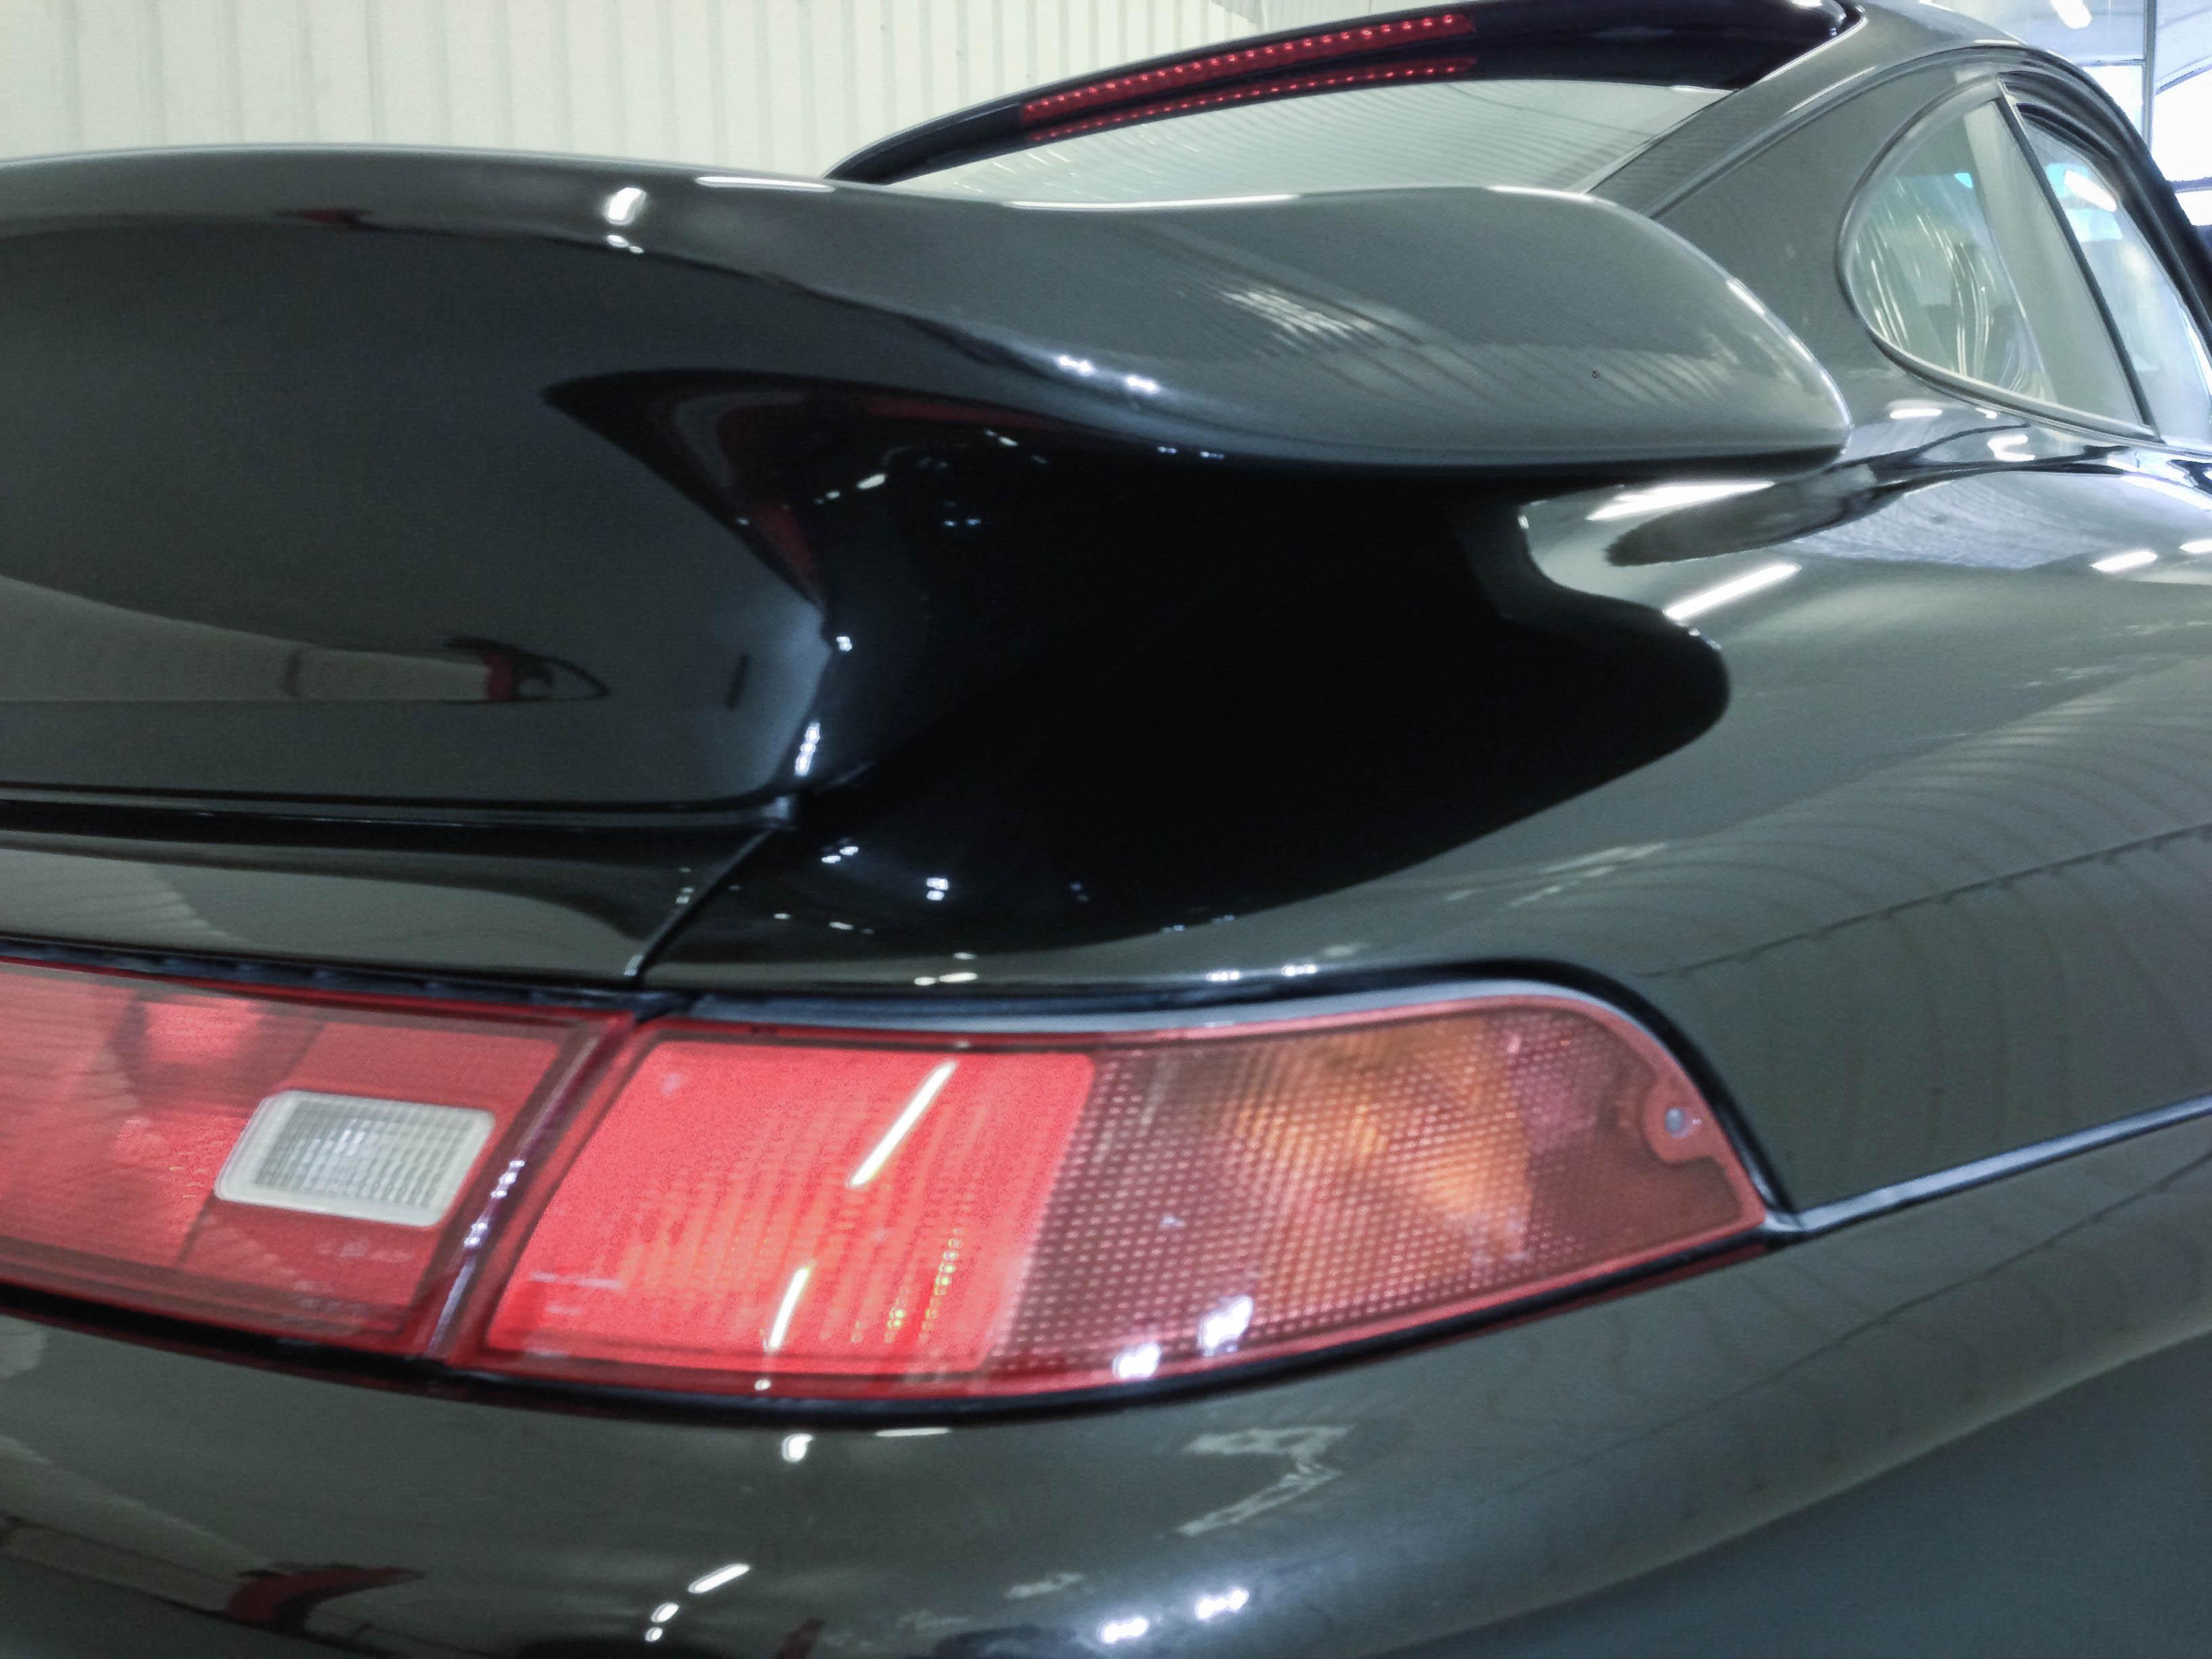 Porsche 911 Turbo – Light detail